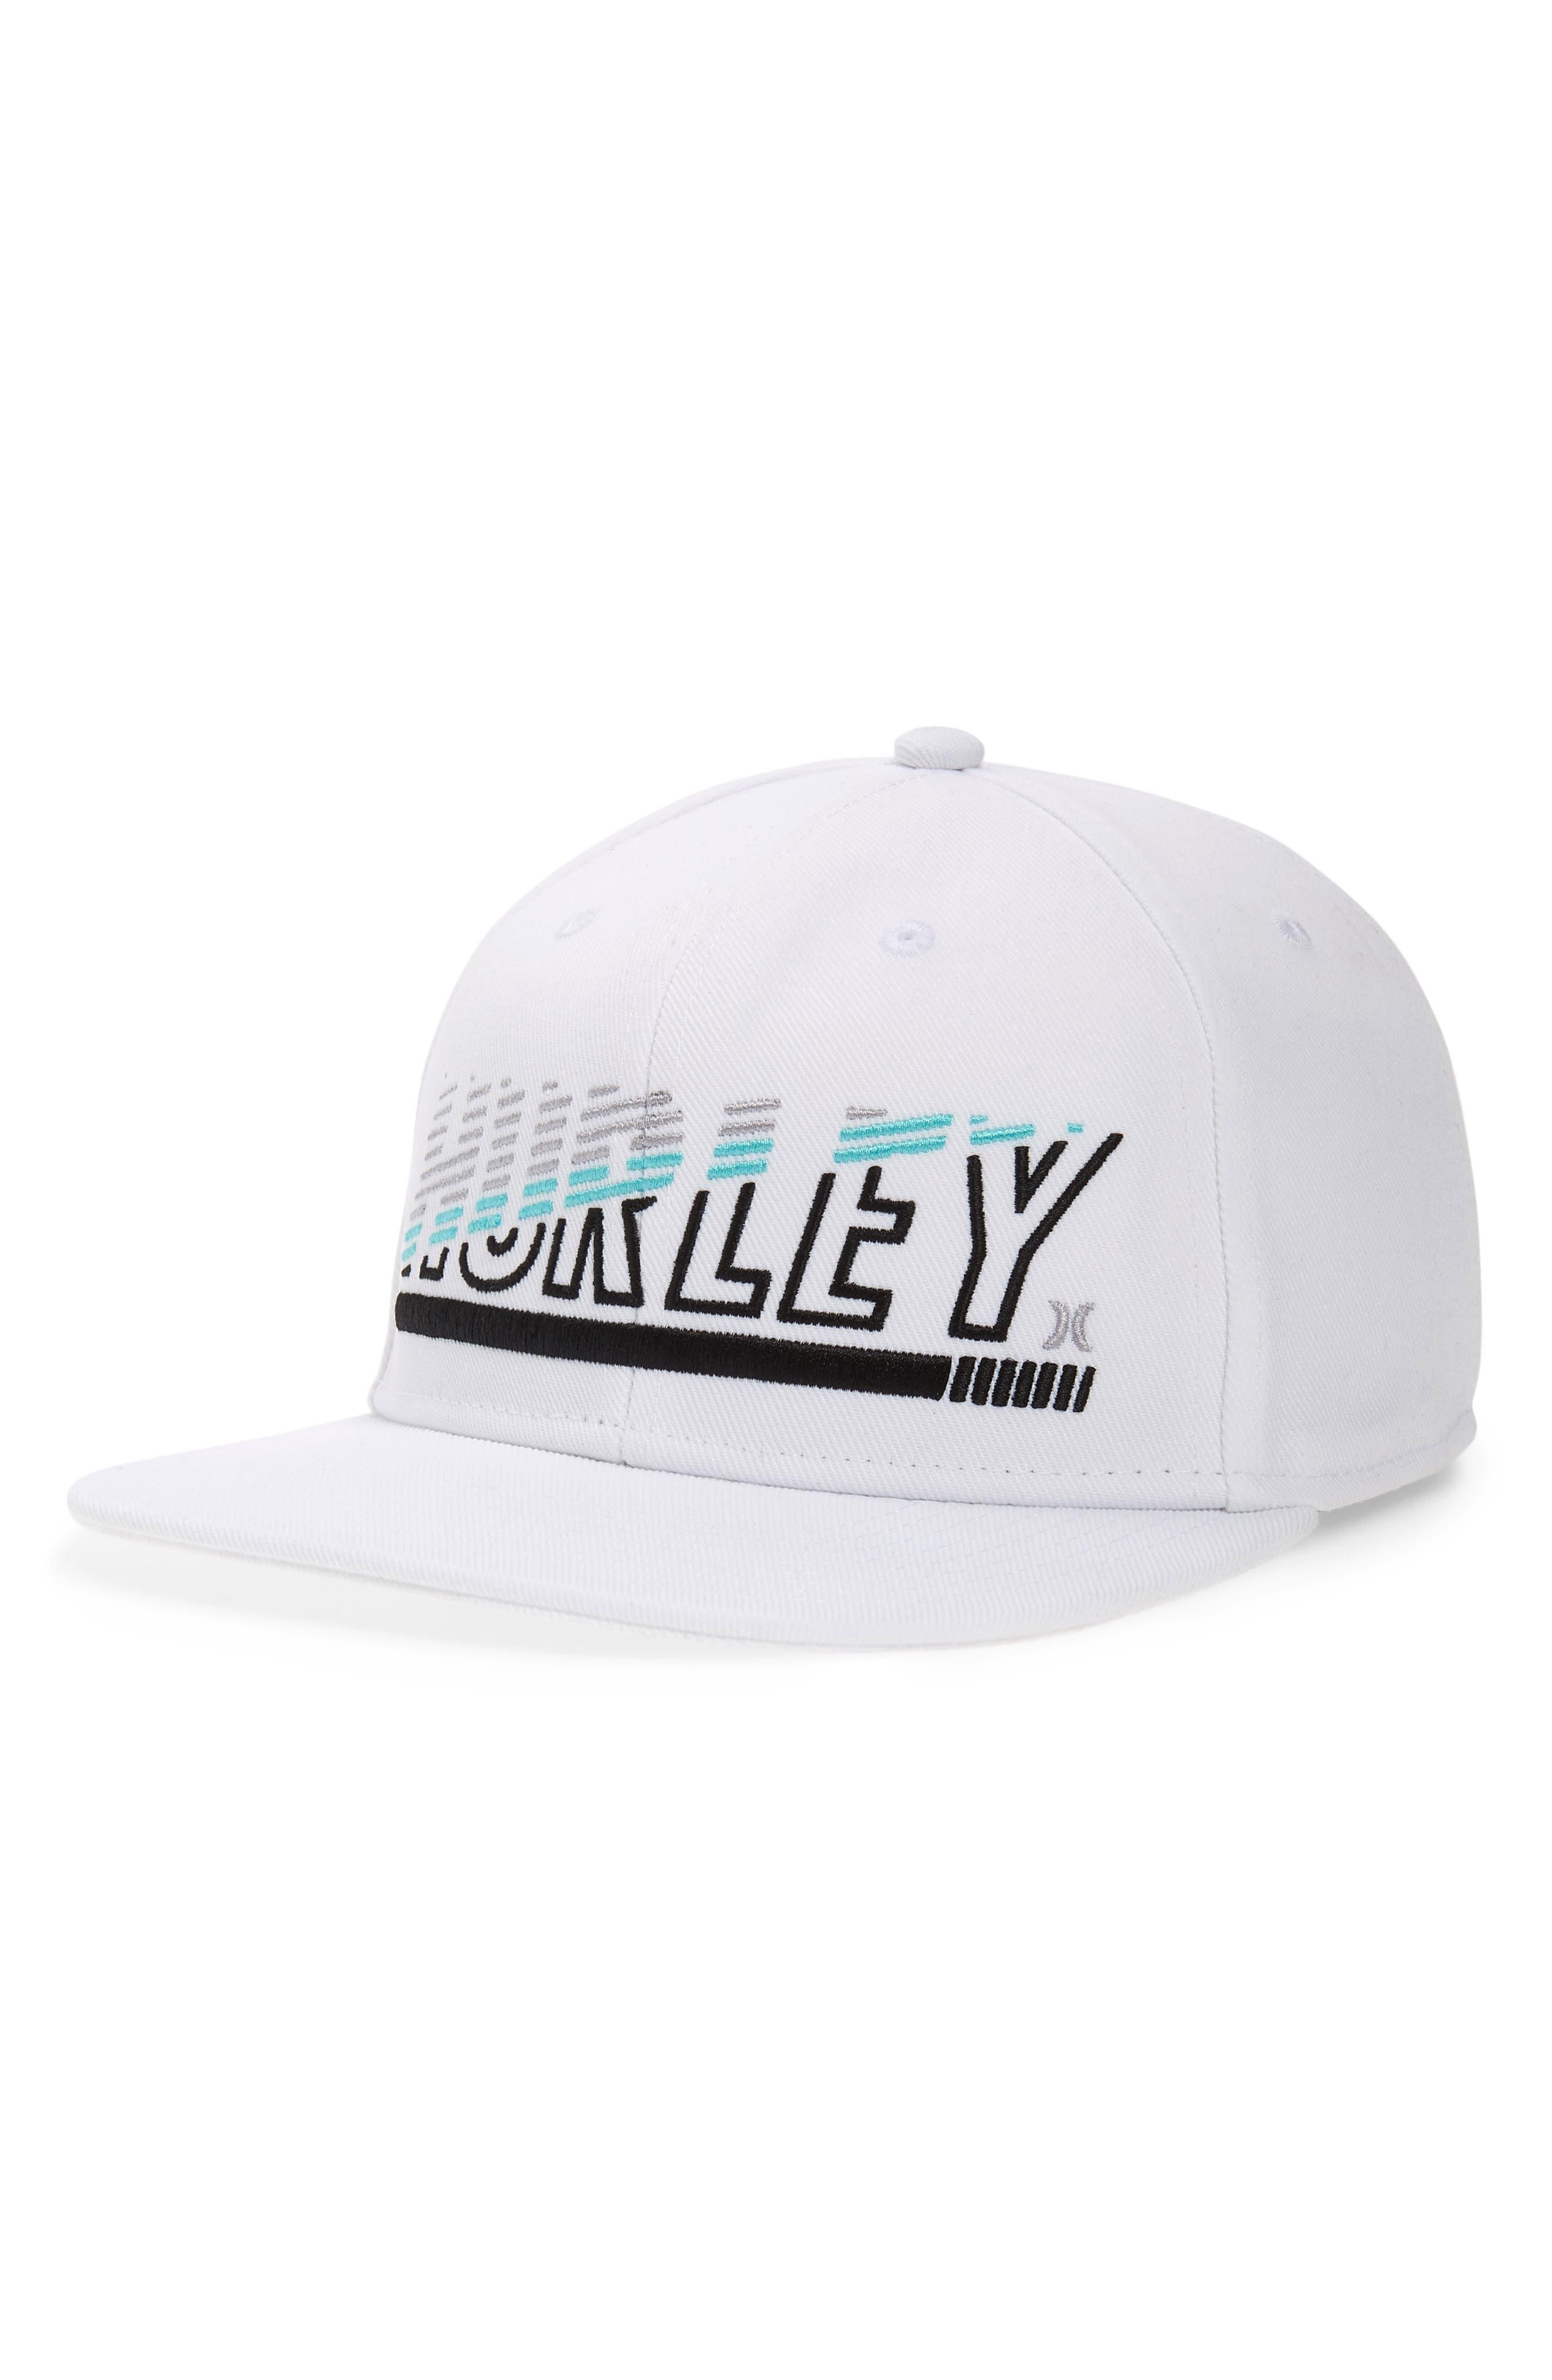 HURLEY Chopped Snapback Cap, Main, color, WHITE